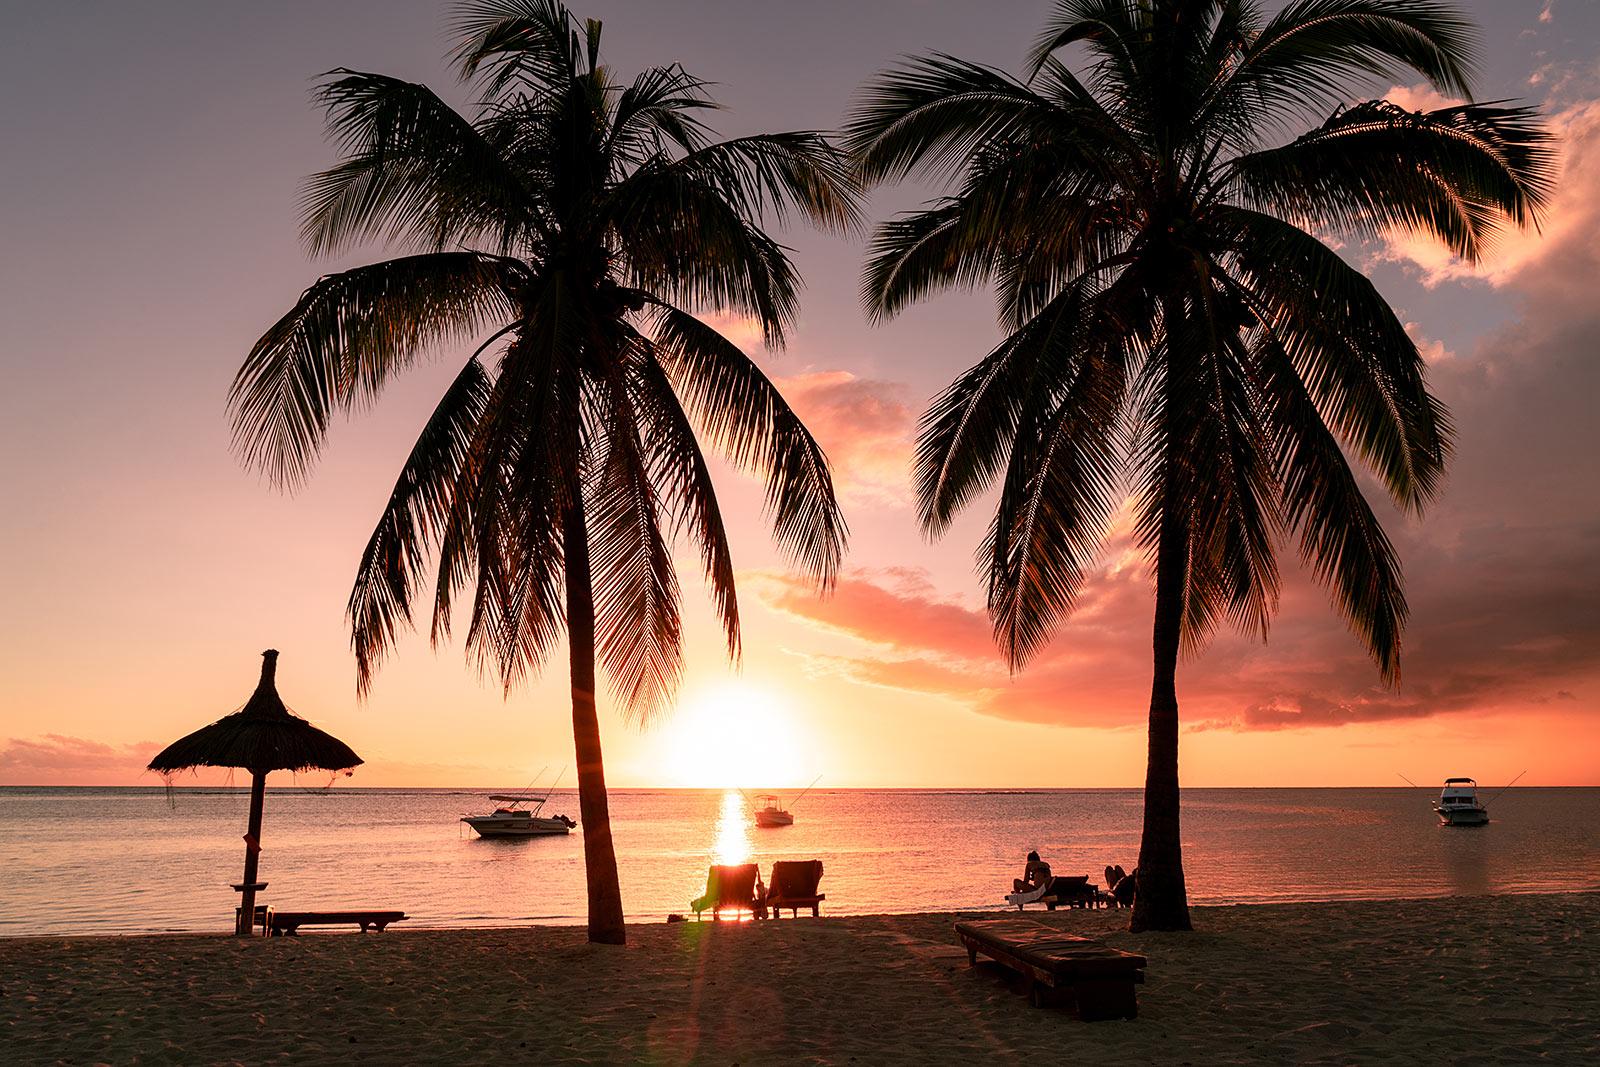 mauritius sonnenuntergang strand hotel sofitel travel guide sunnyinga